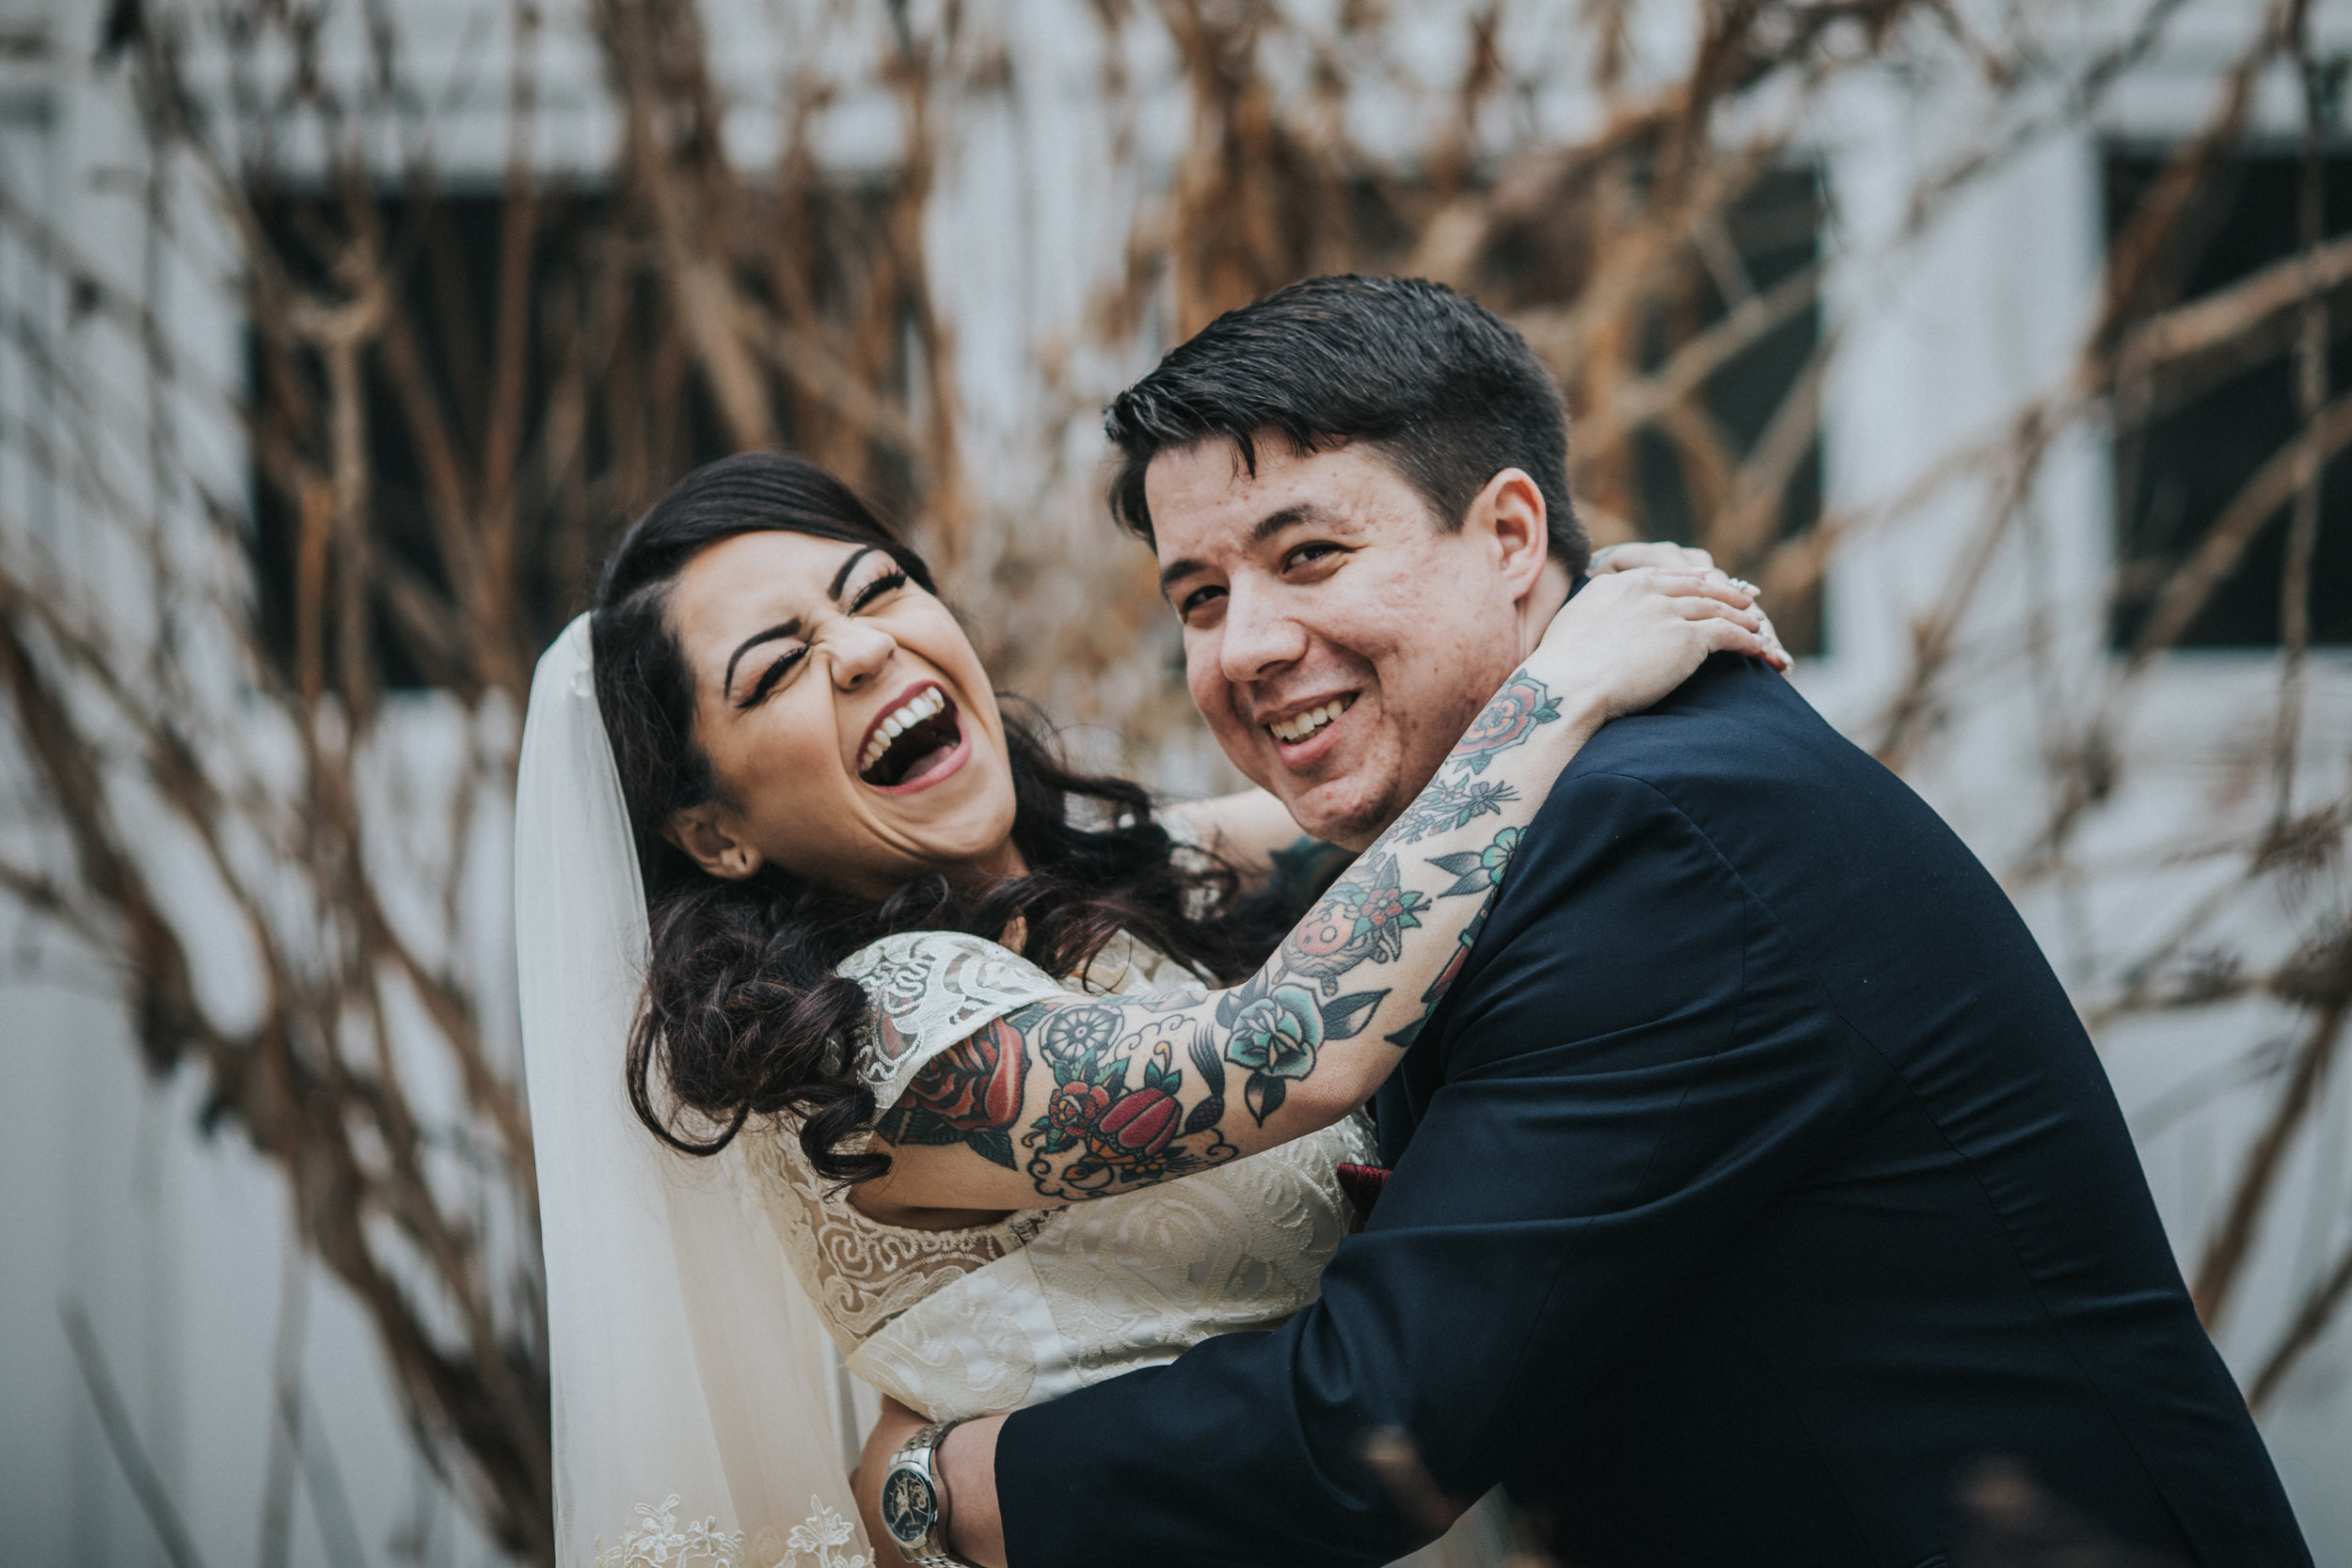 New-Jersey-Wedding-Photographer-ReceptionCenter-Valeria&Mike-First-Look-Bride&Groom (42 of 69).jpg